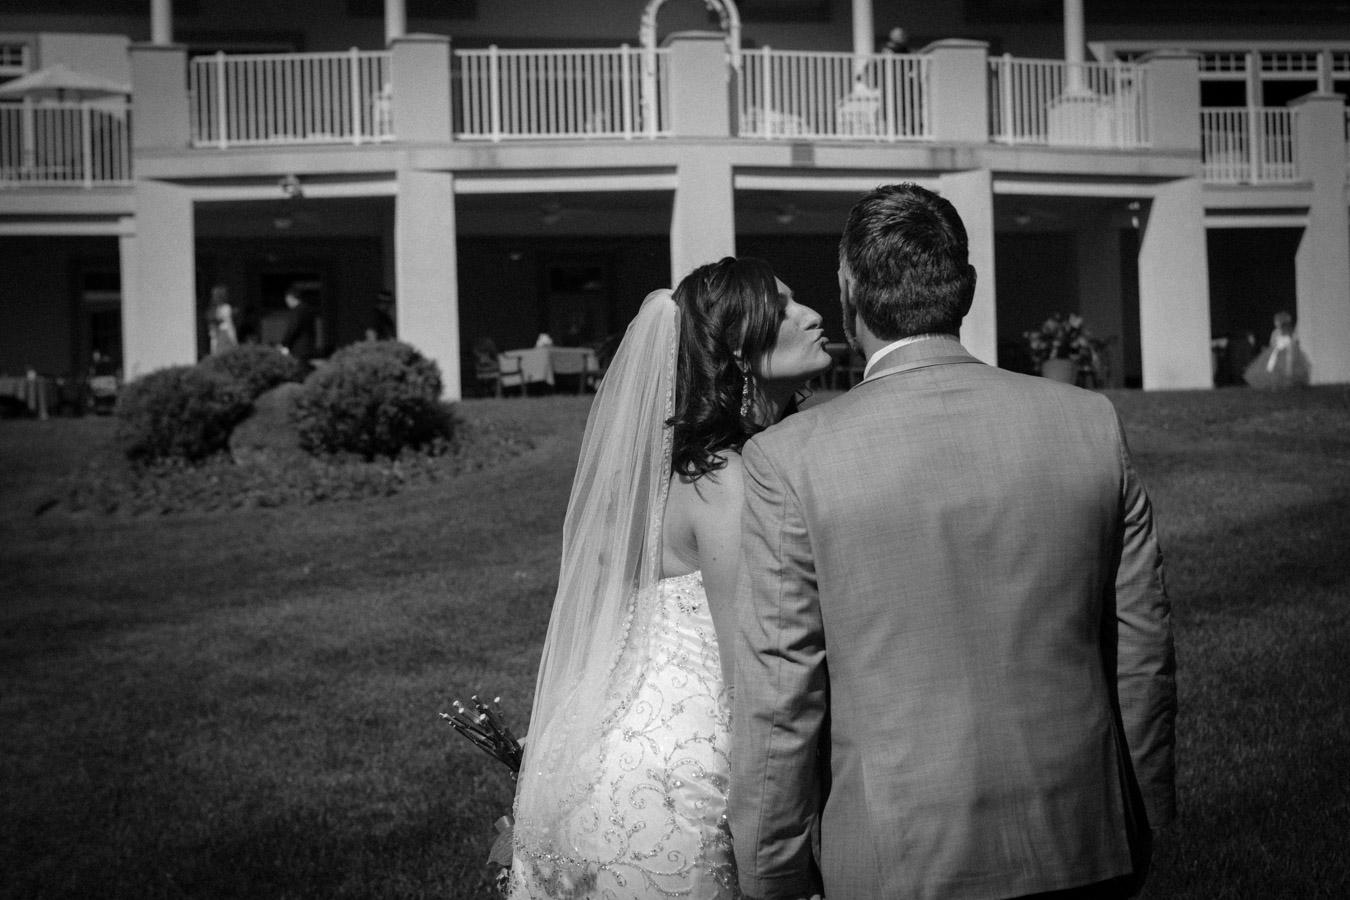 NEPA_Pocono_Weddings_Rob_Lettieri_Photography_09.jpg